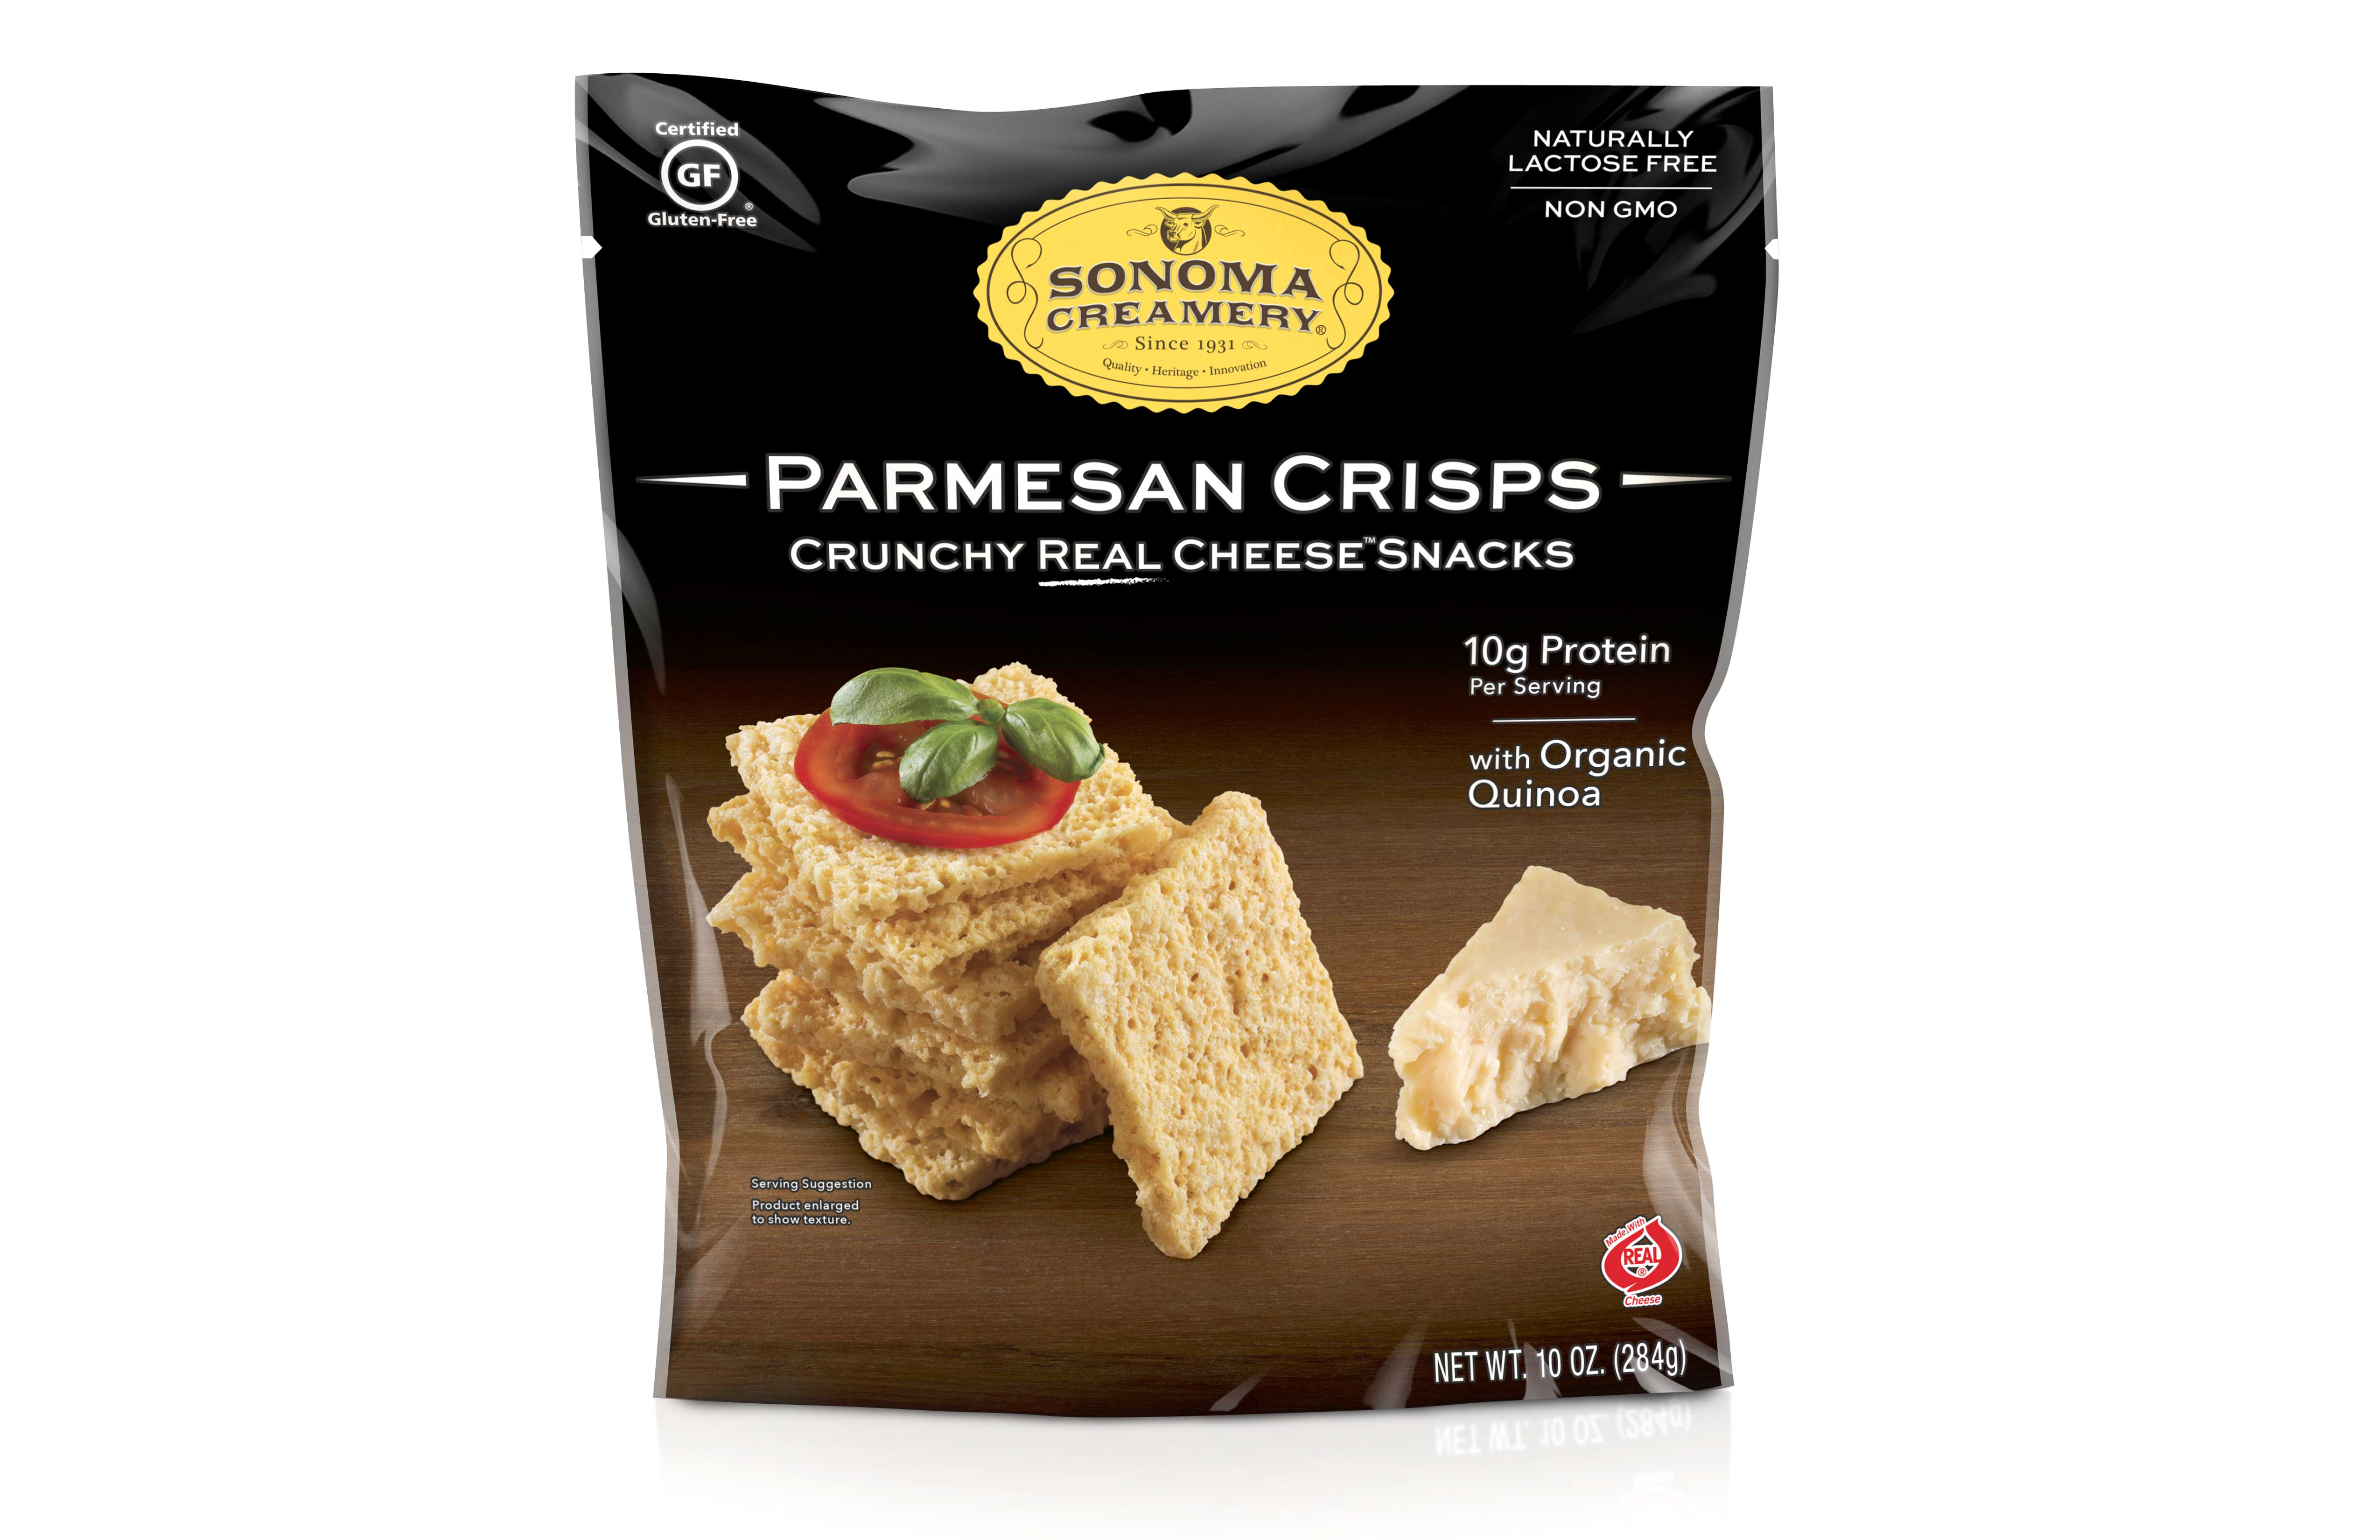 Sonoma Creamery Parmesan Crisps